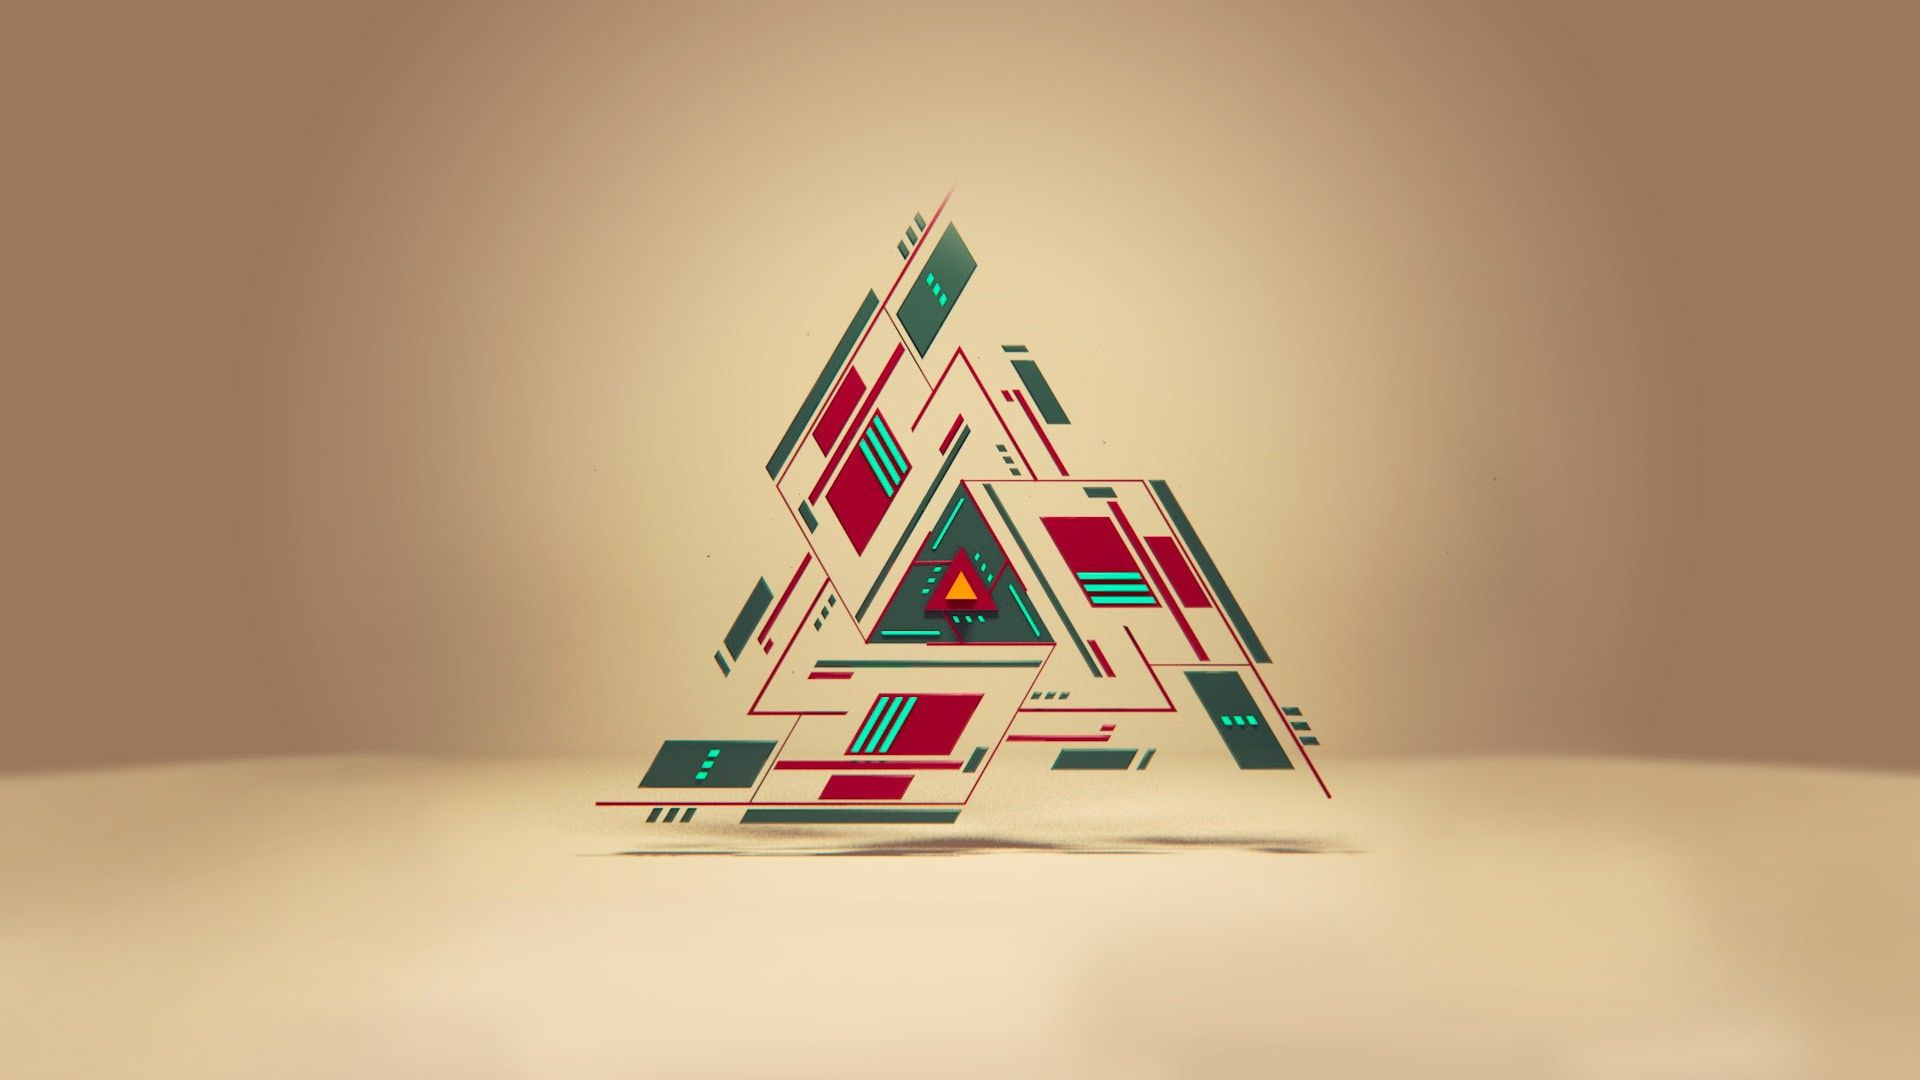 4k 3d Geometric Wallpapers Top Free 4k 3d Geometric